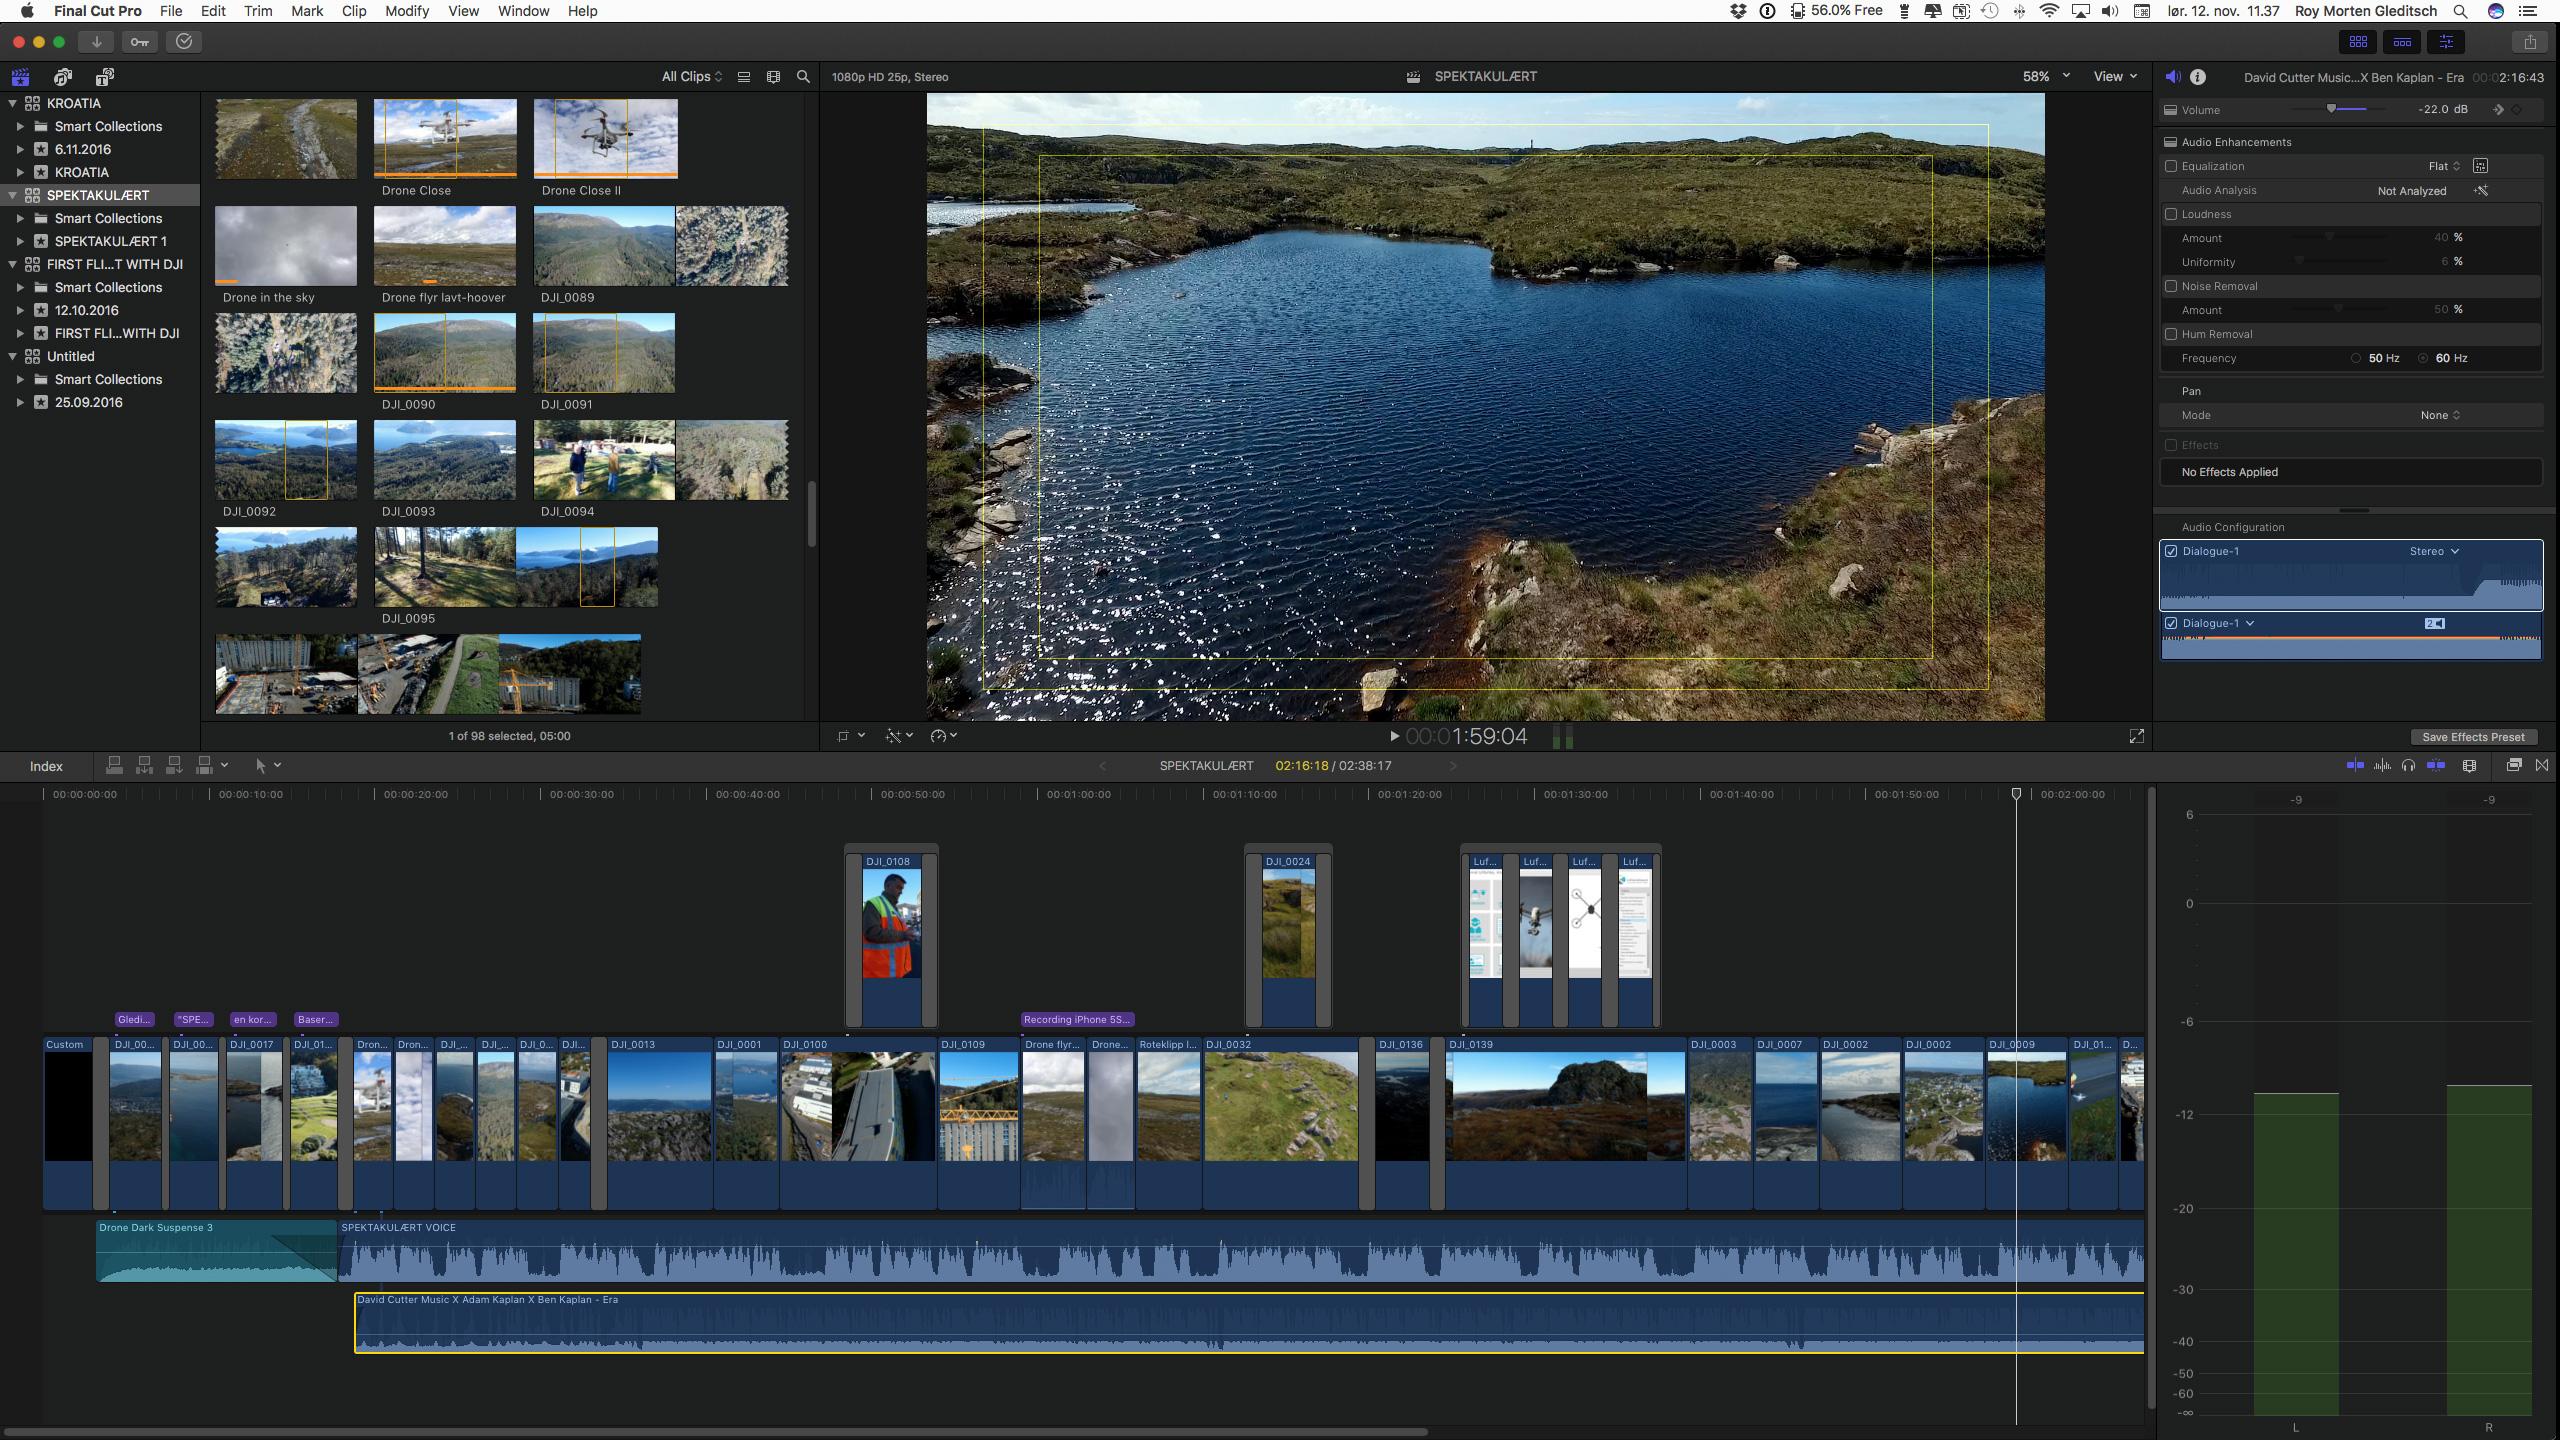 Kvalitetsikring av filmlyd: Final Cut Pro (skjermbilde)